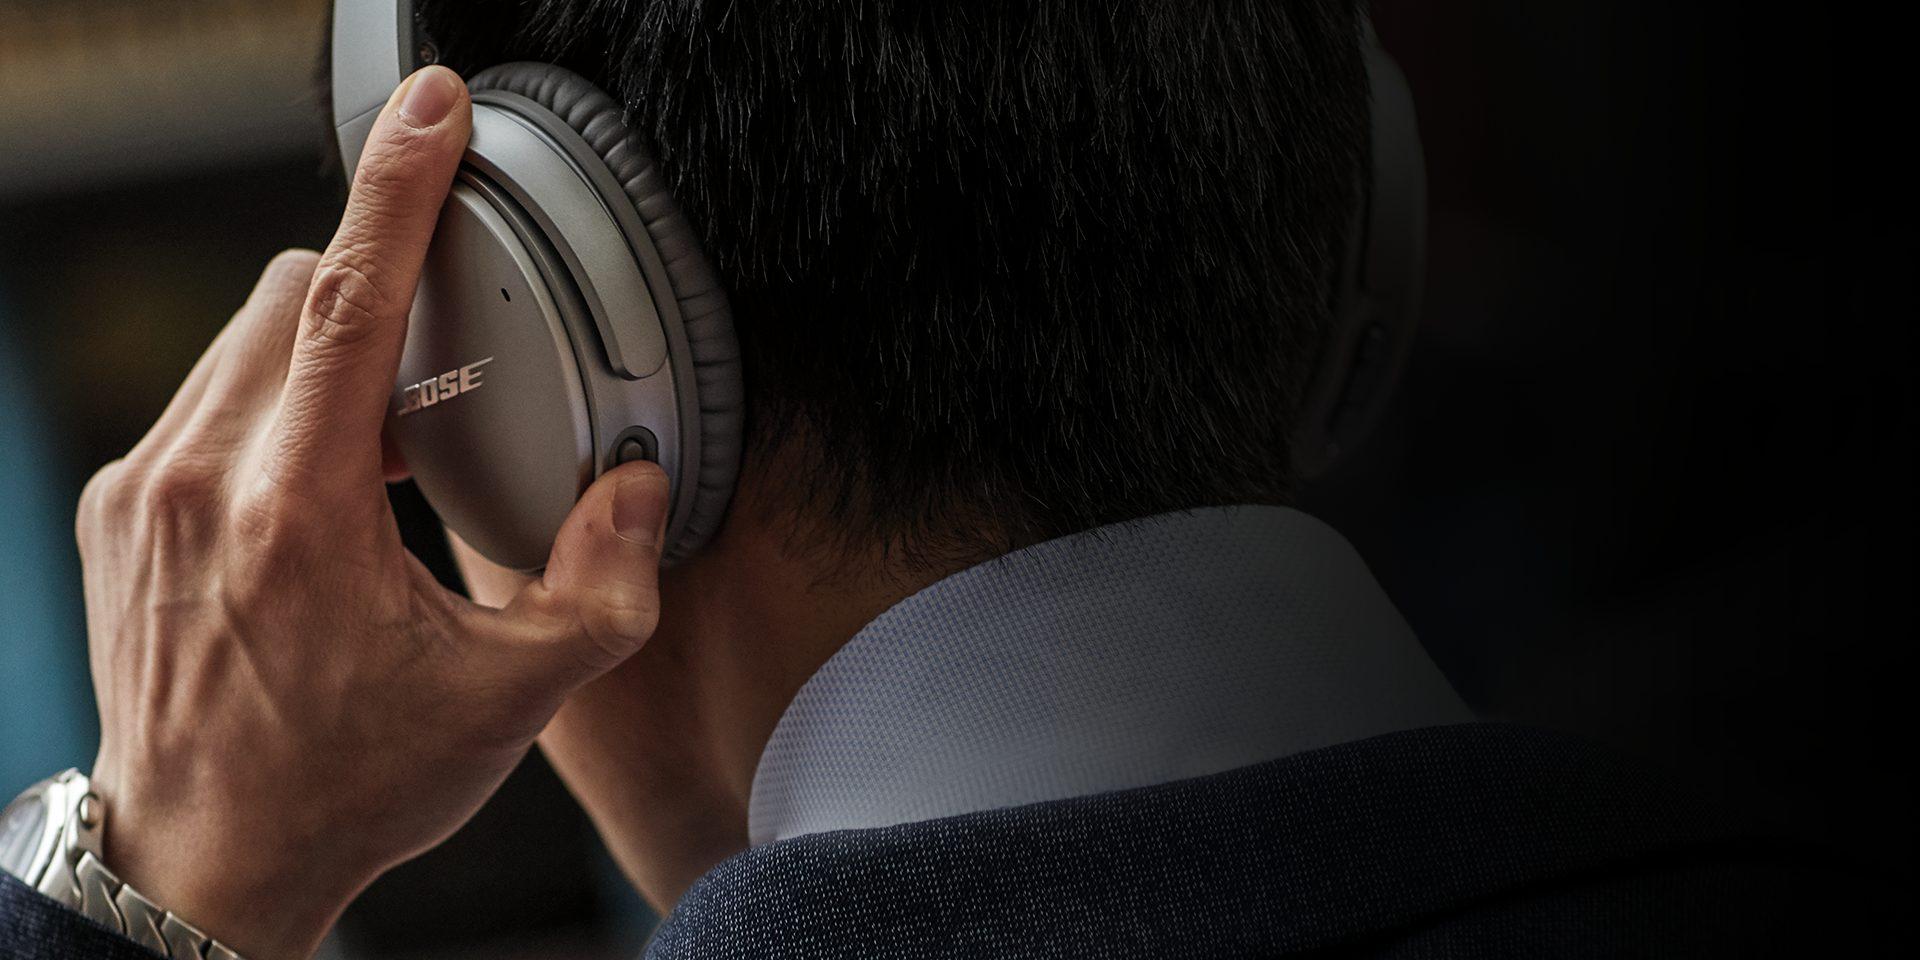 Bose Quietcomfort 35 Wireless Headphones Ii Black Two Simple Relay Based Motorcycle Alarms Voice